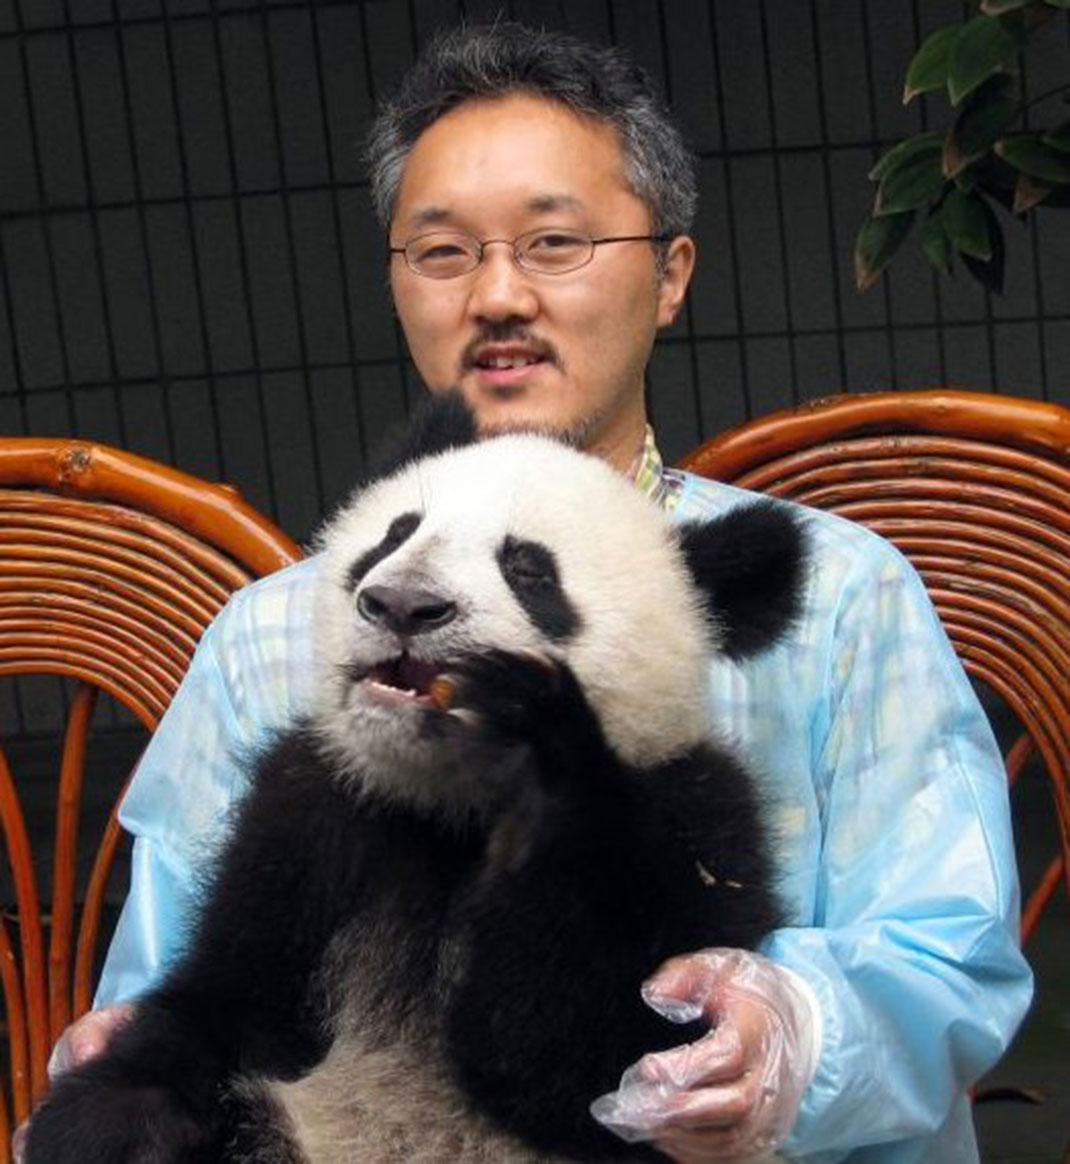 homme-panda